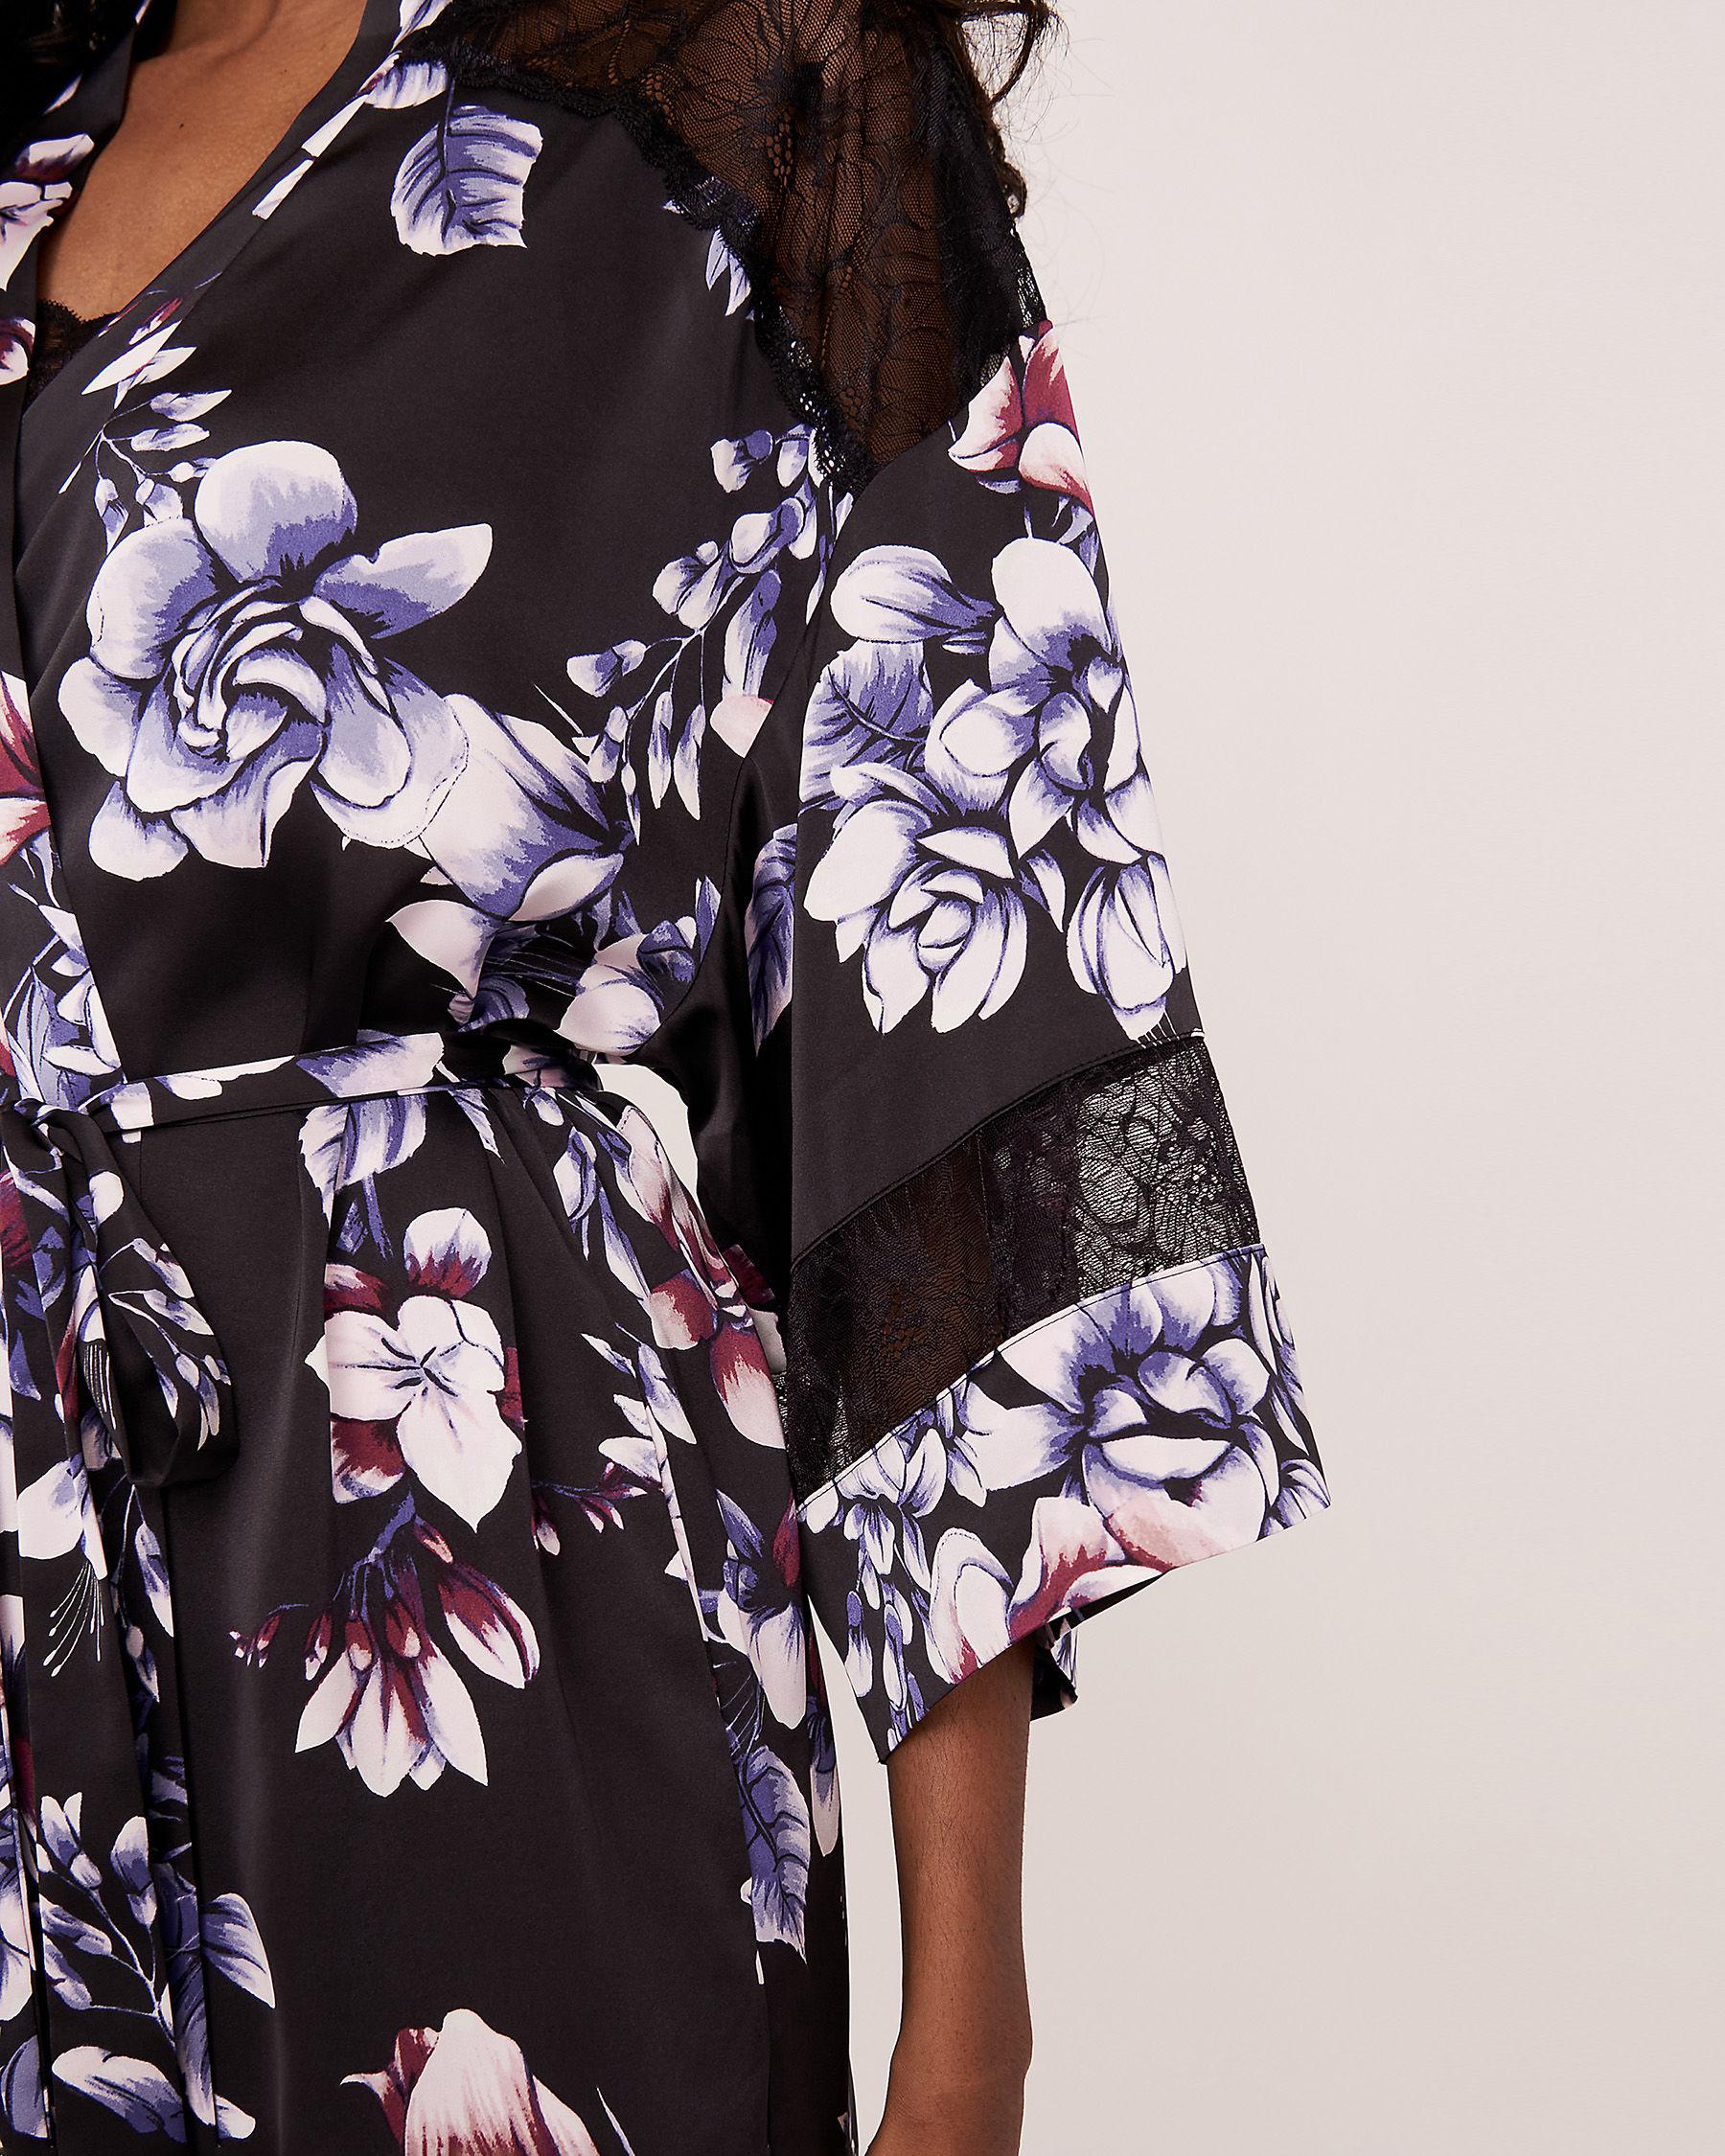 LA VIE EN ROSE Kimono en satin garniture de dentelle Fleurs aquarelles 60600007 - Voir4